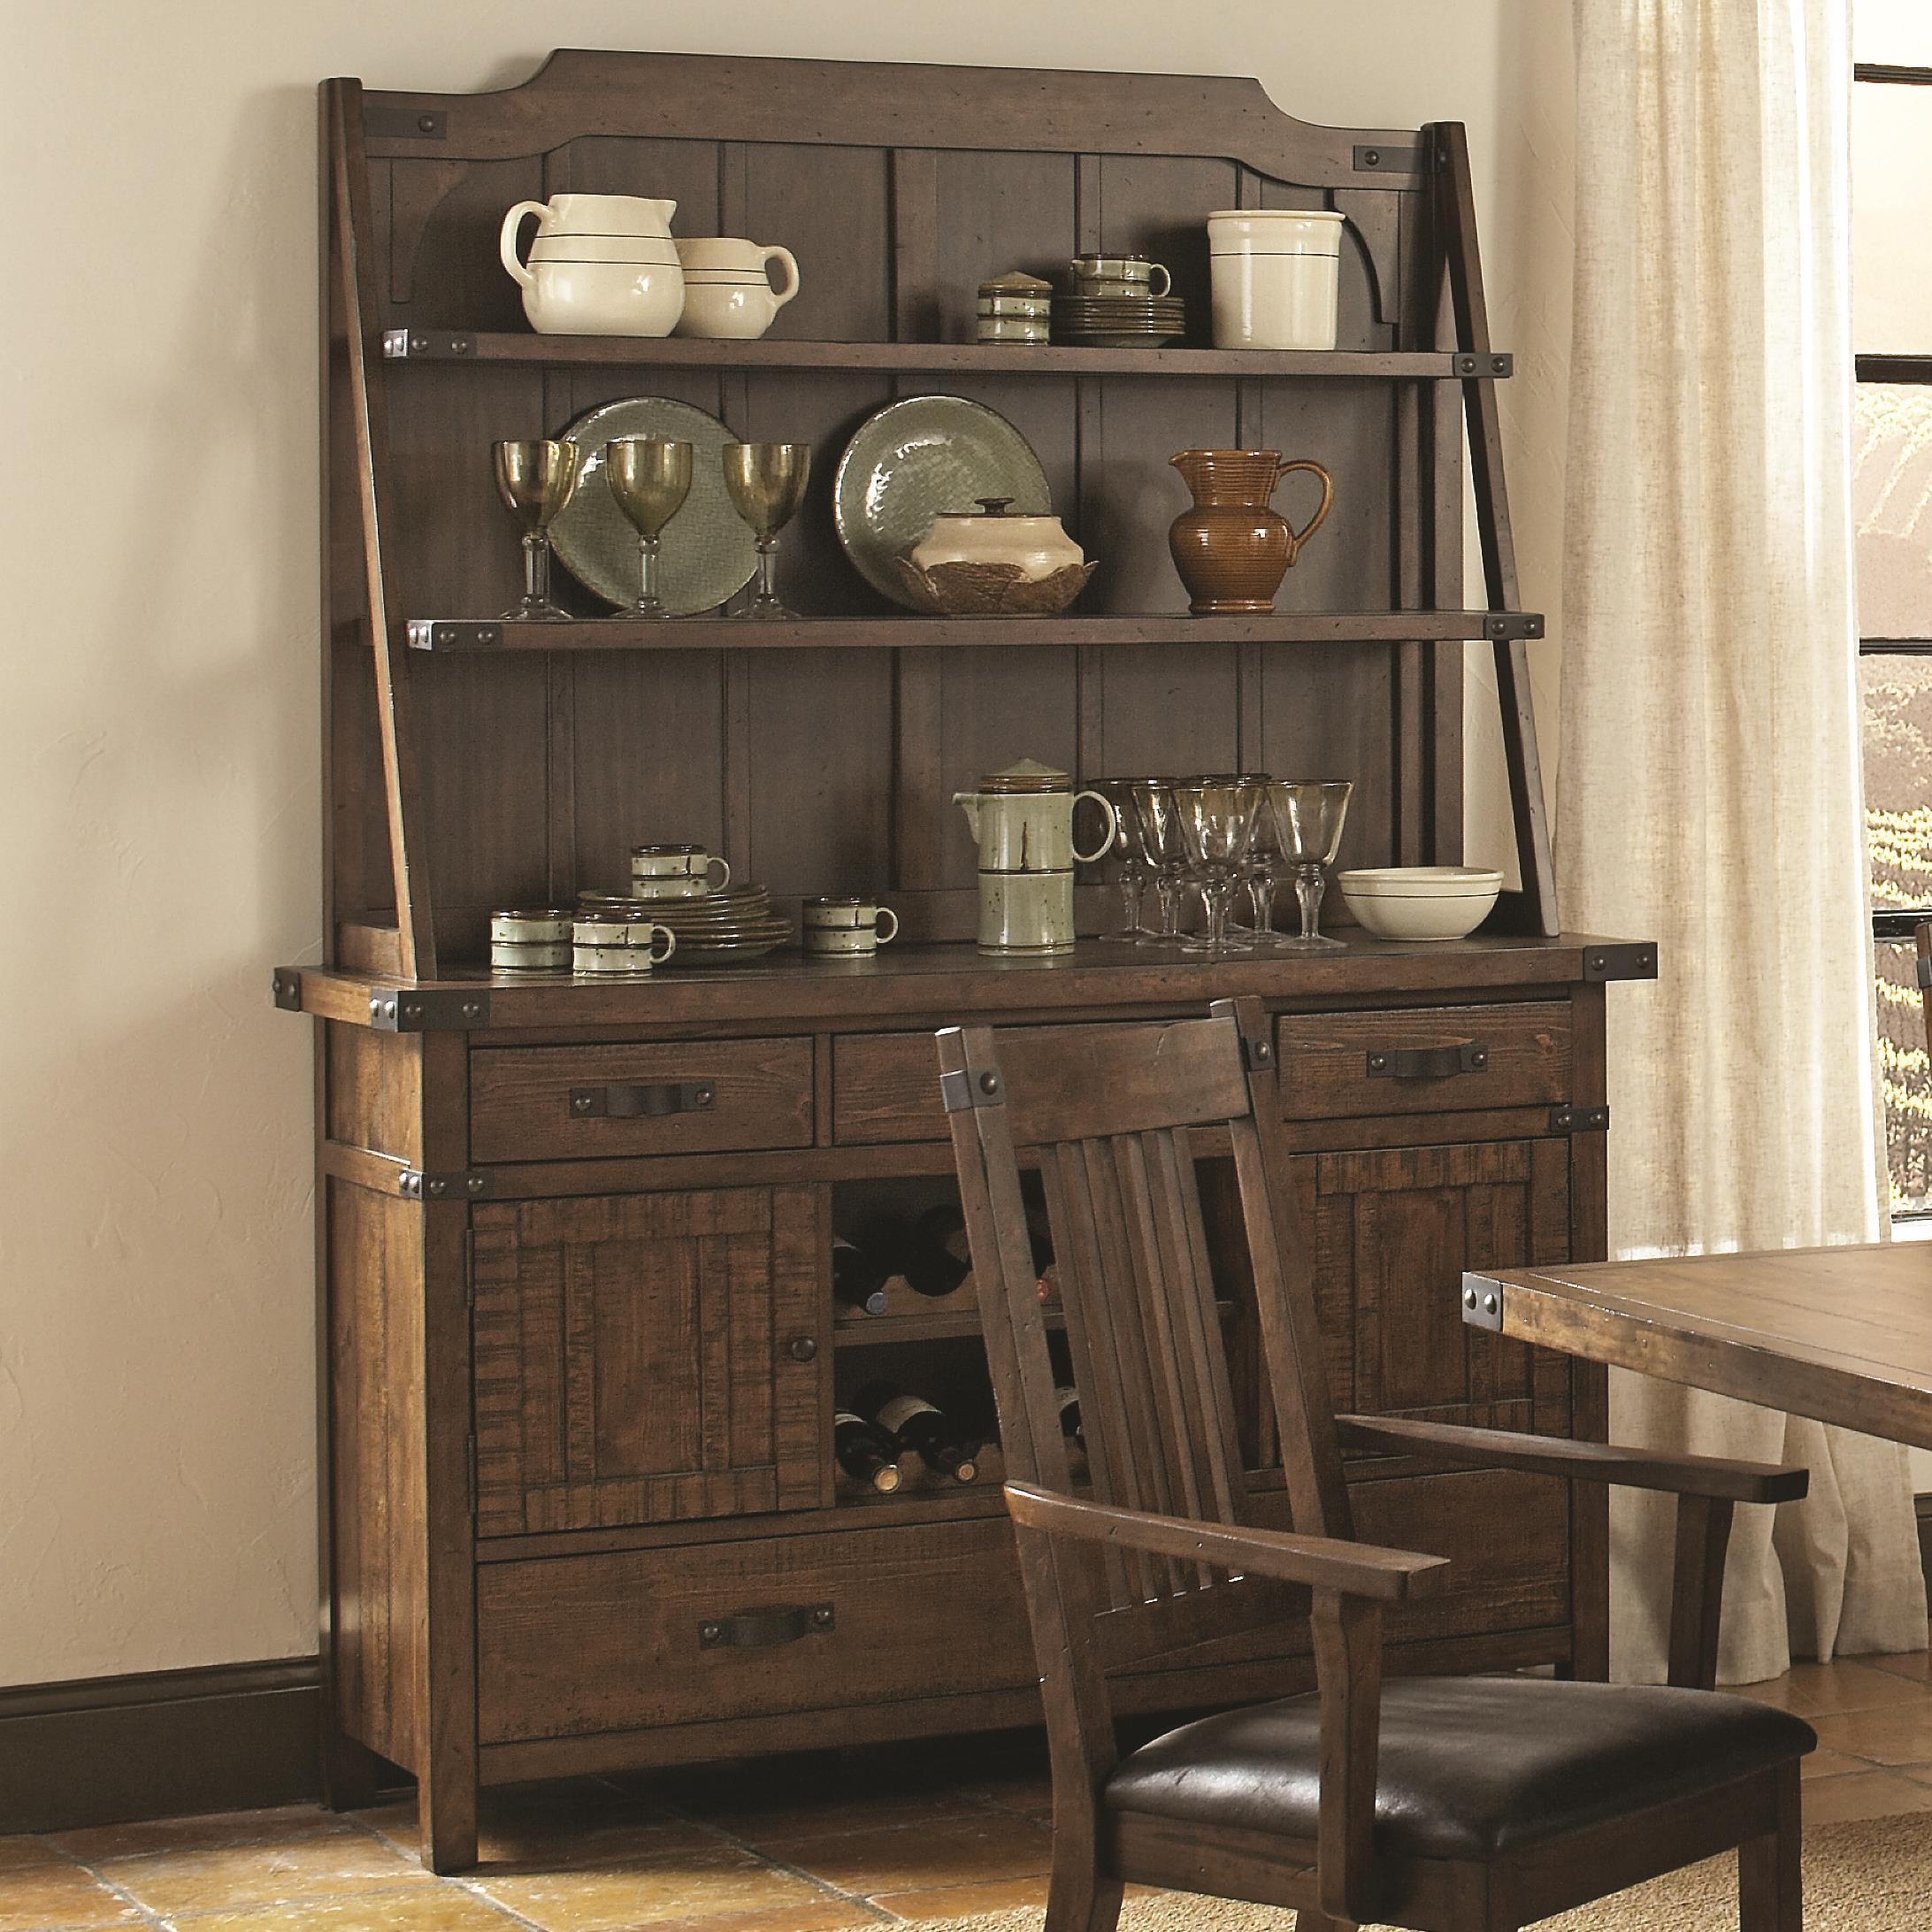 xxx wine cabinet do rustic world product java greyson storage market